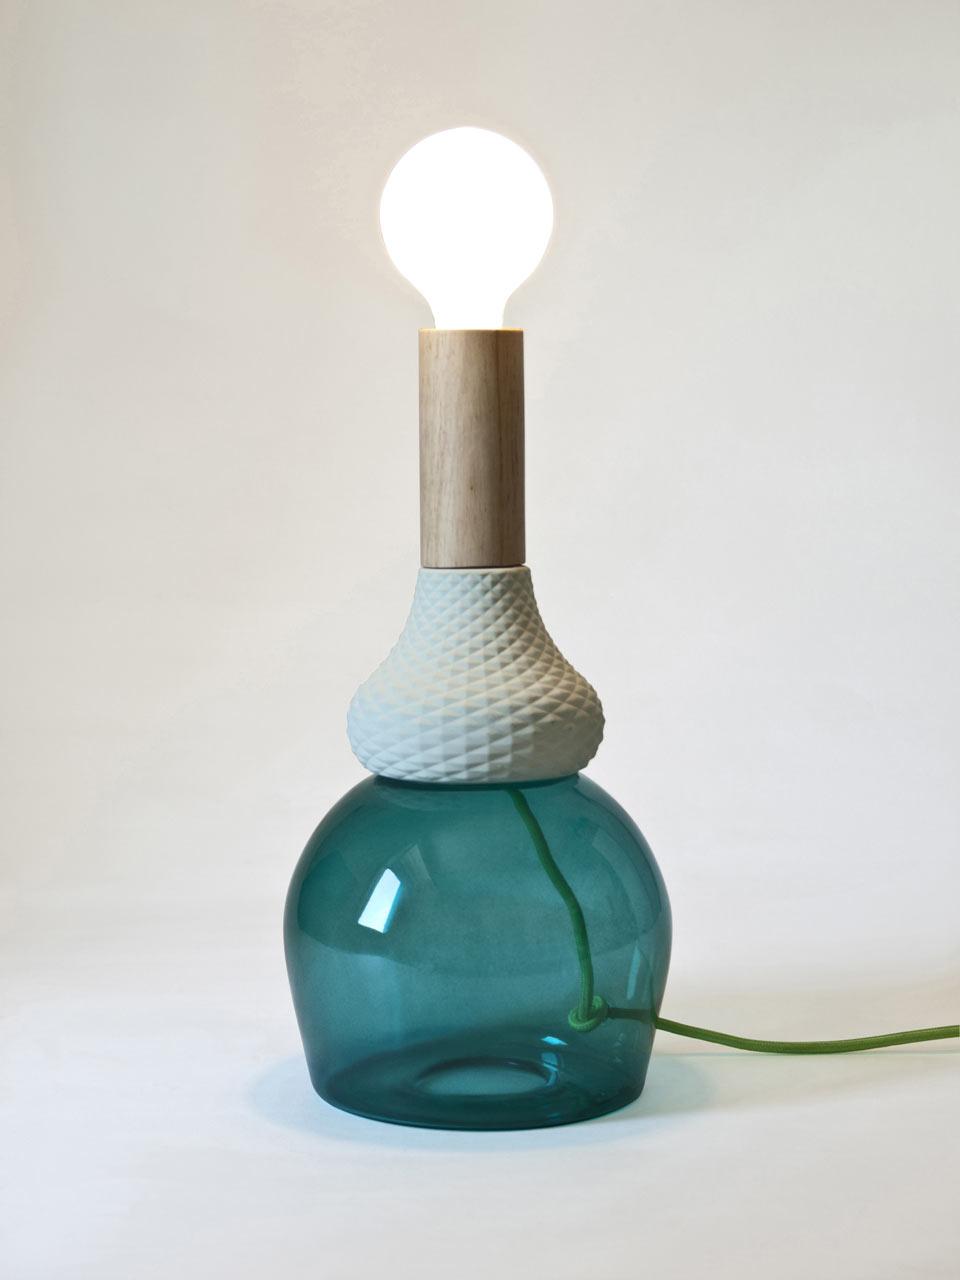 MRND Lamps By Elena Salmistraro For Seletti Design